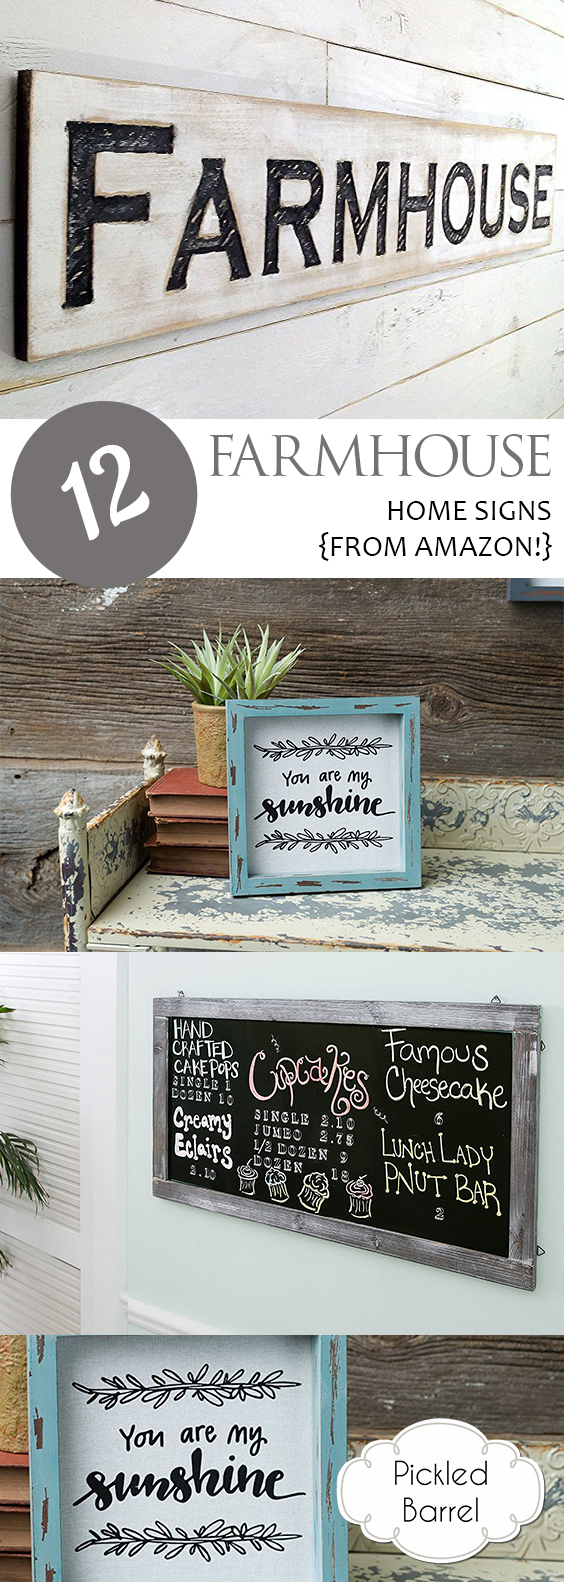 12 Farmhouse Home Signs {from Amazon!} | Farmhouse, Farmhouse Home Decor, Farmhouse DIY, DIY Farmhouse Decor, Farmhouse Home Decor, Farmhouse Signs, Wall Hangings, DIY Wall Hangings #FarmhouseHome #DIYFarmhouseDecor #FarmhouseDIY #RusticHome